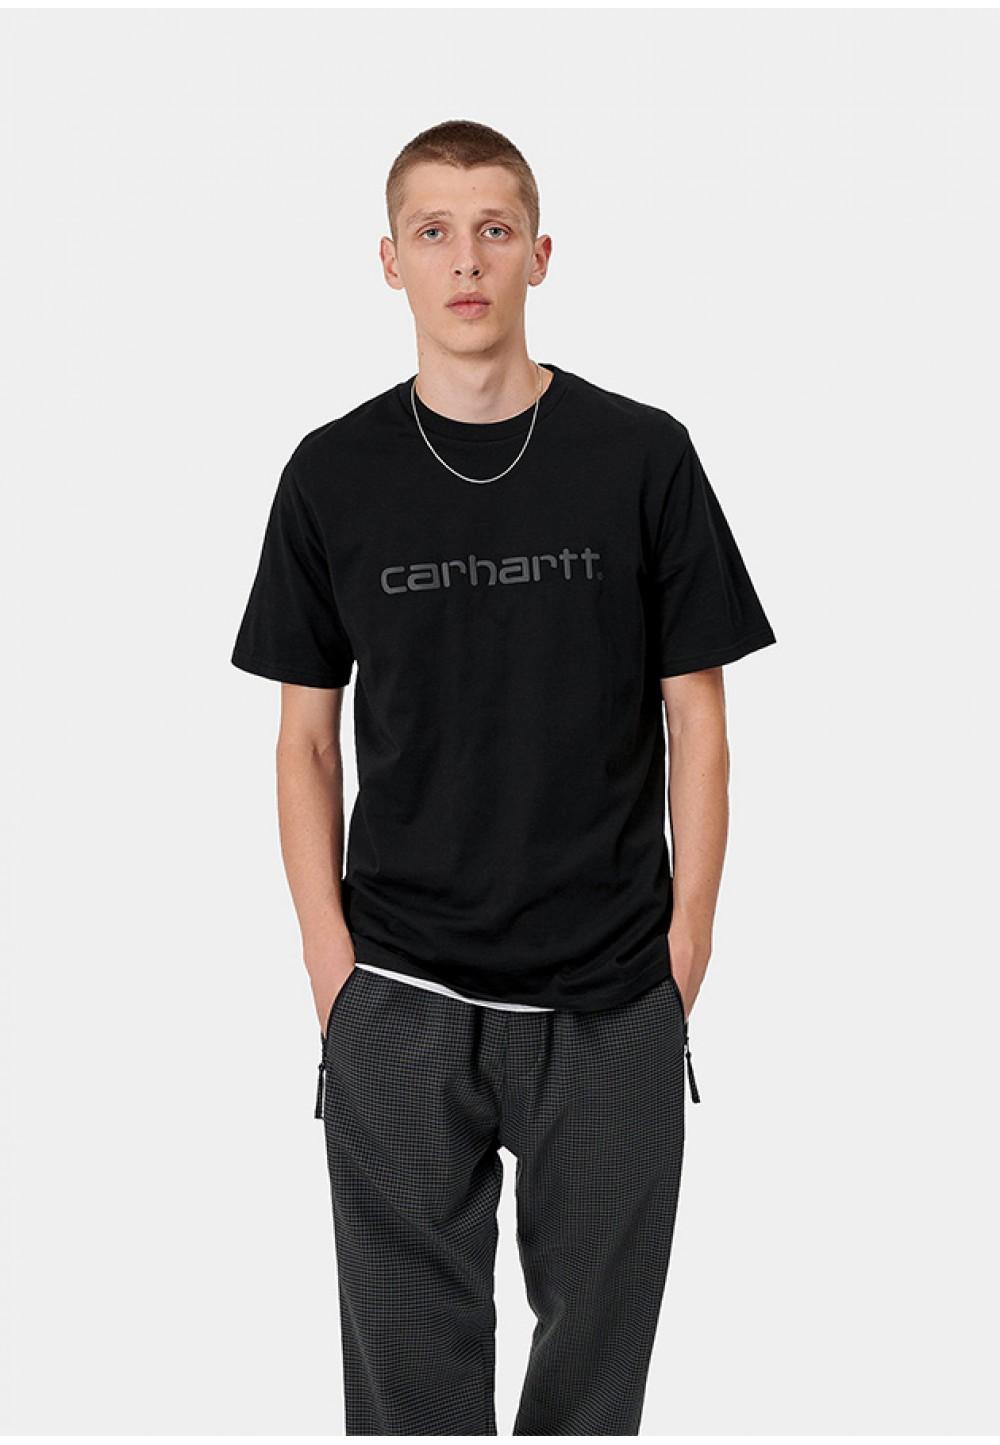 Черная футболка с логотипом